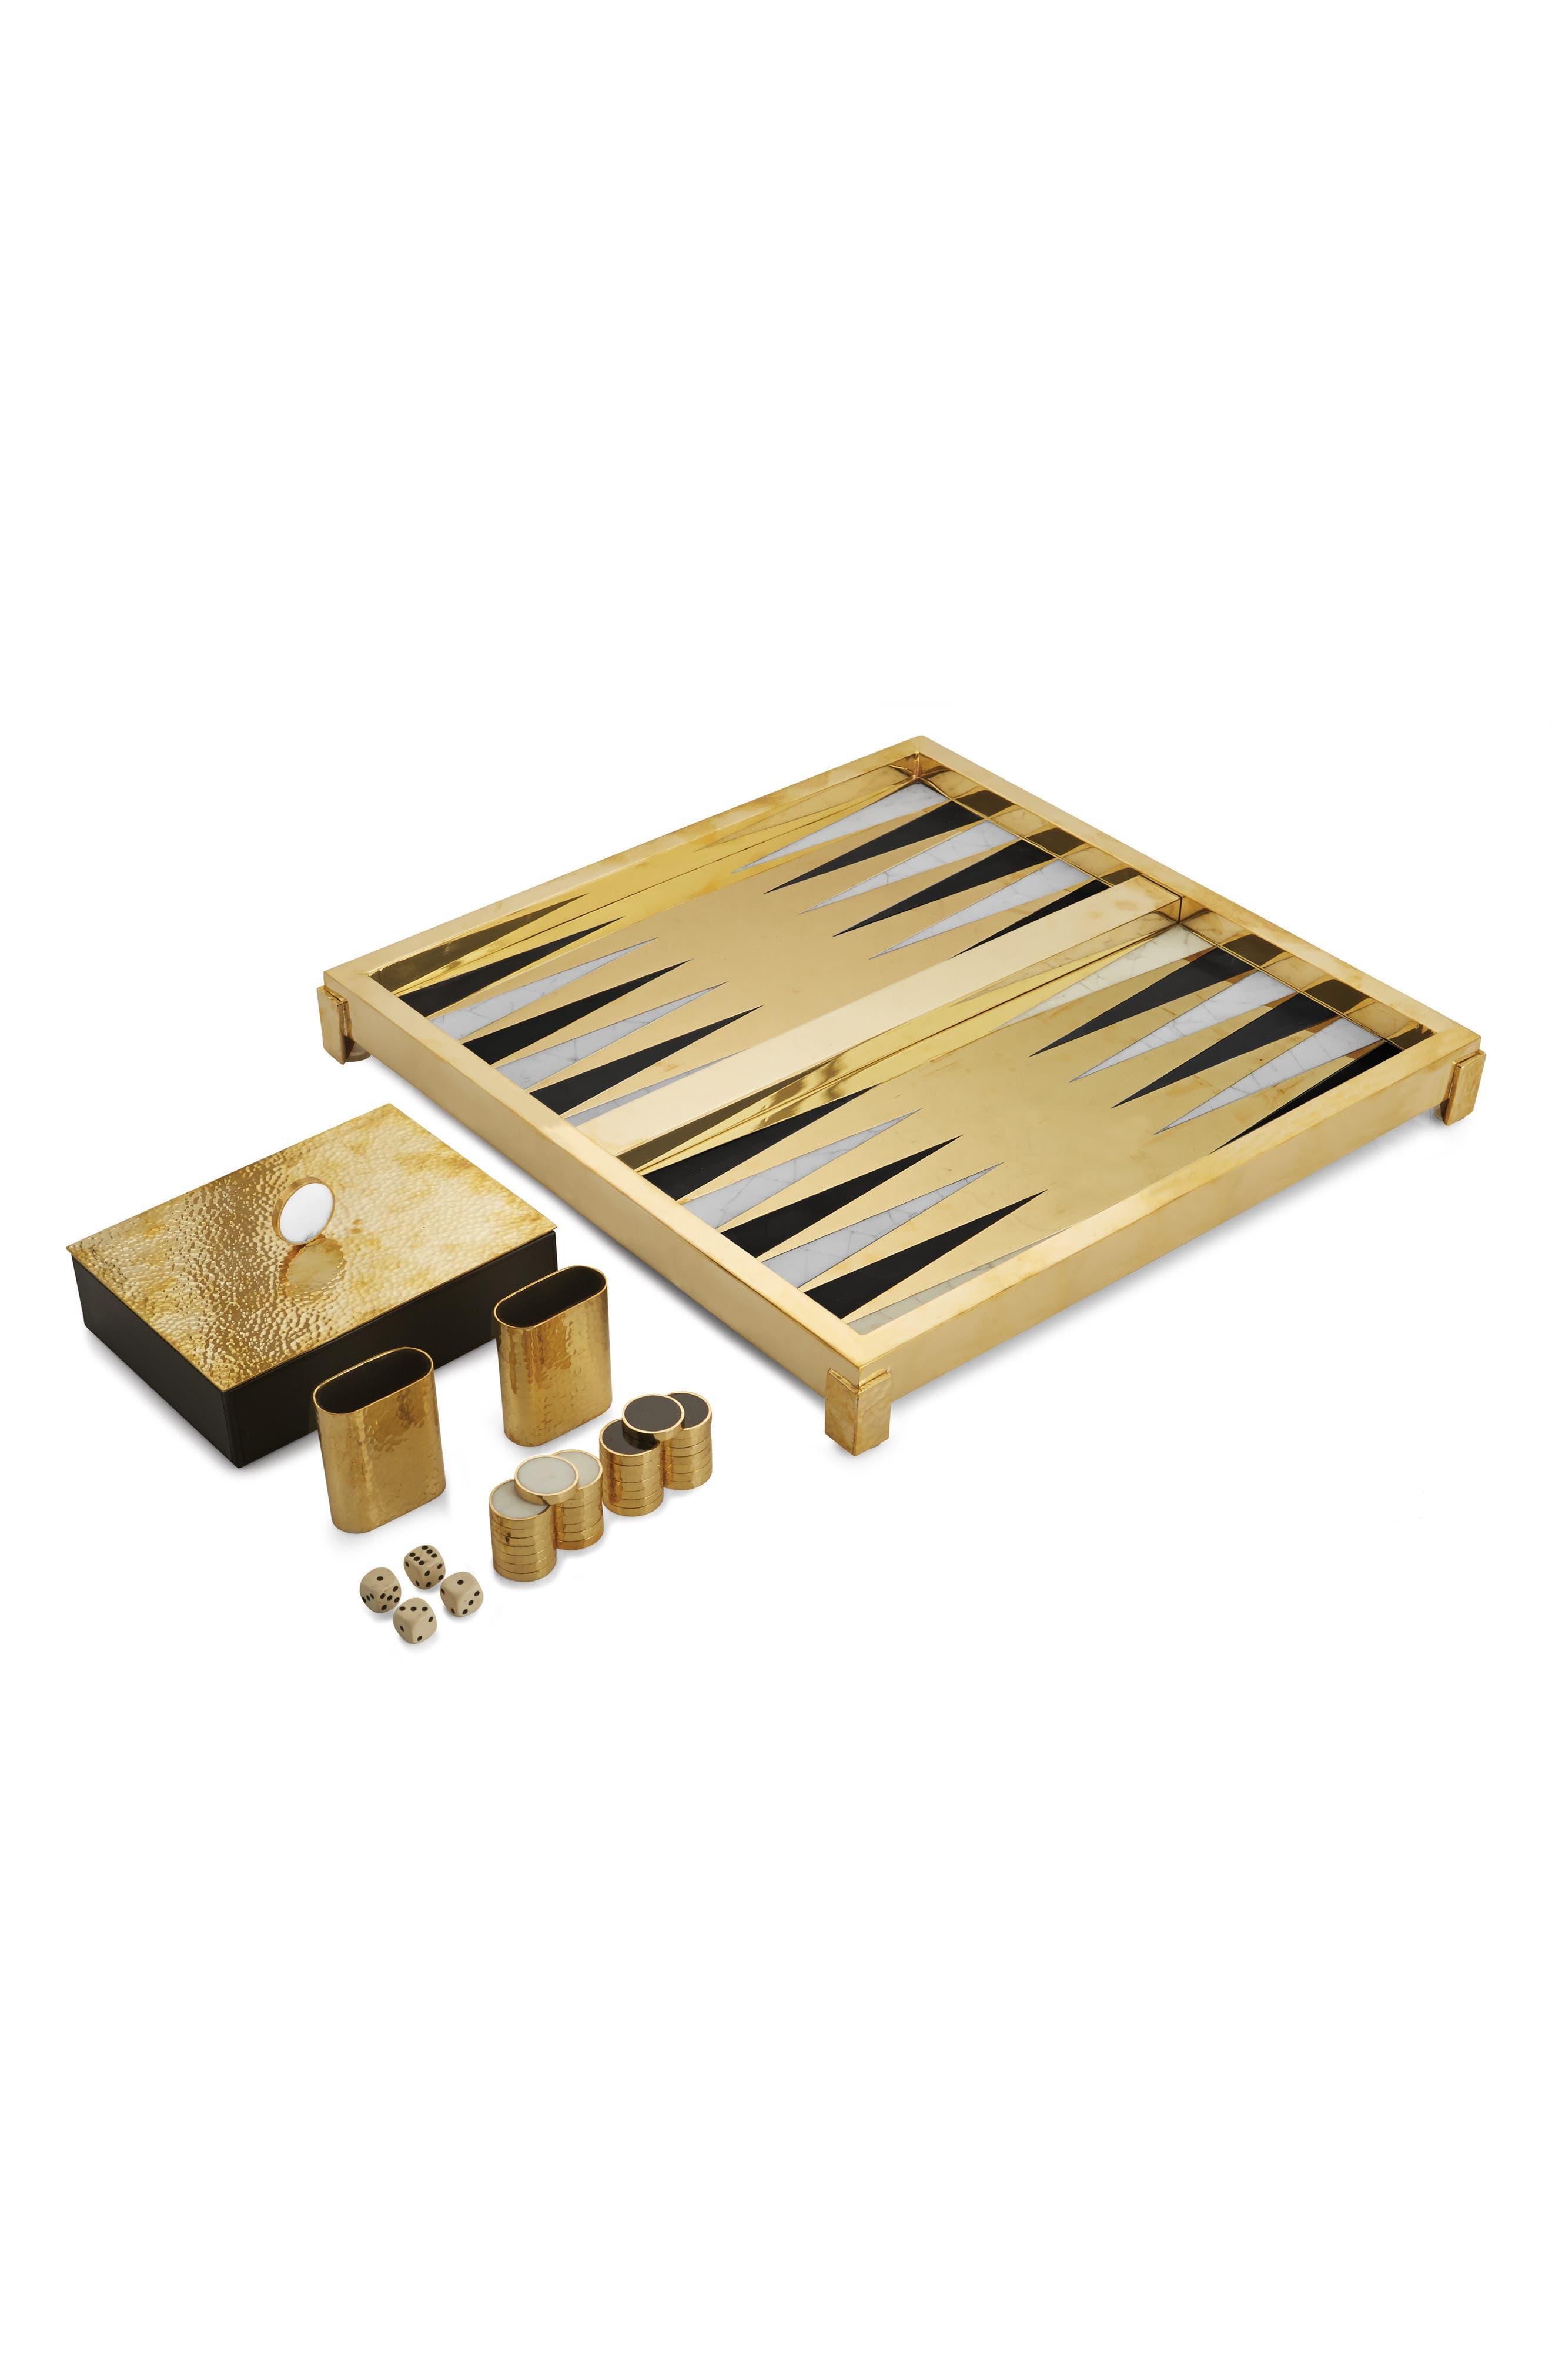 Special Edition Backgammon Set,                             Main thumbnail 1, color,                             METALLIC GOLD